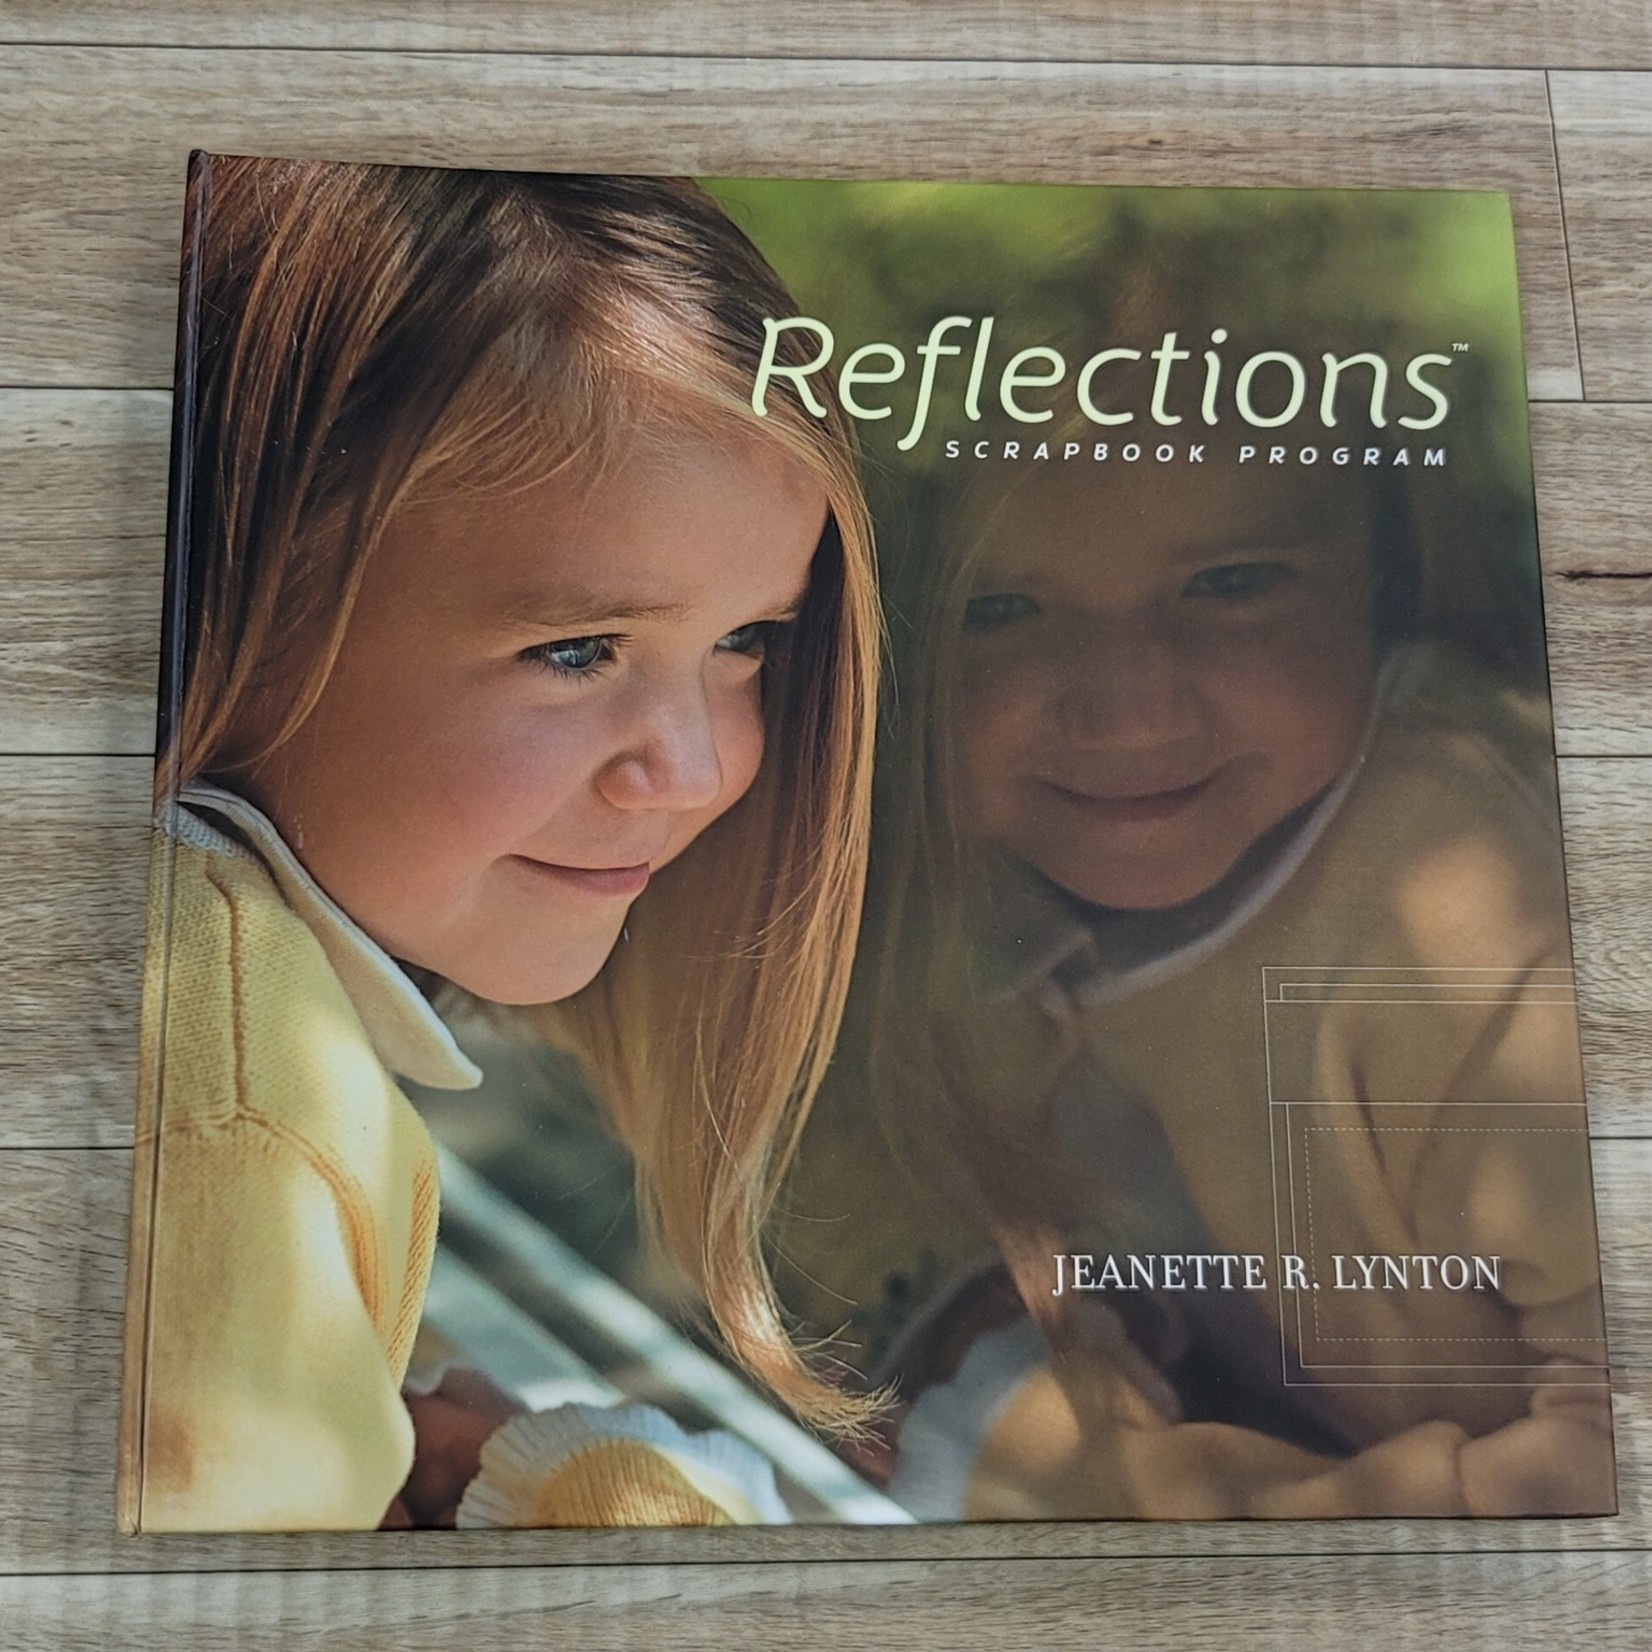 Scrapbooking Books - Reflections - Scrapbook Program